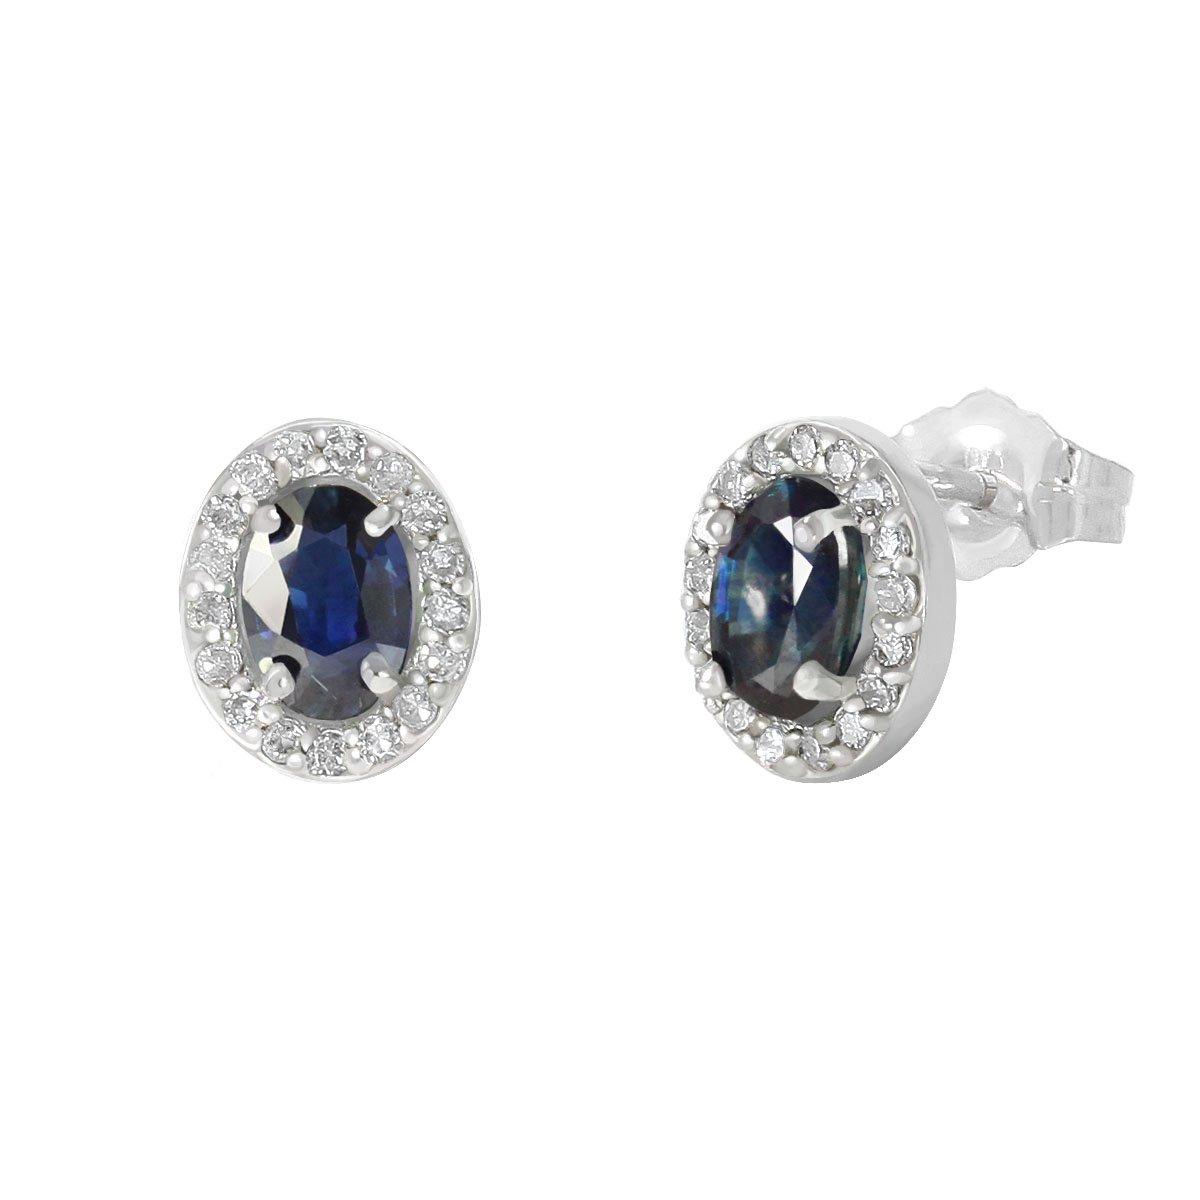 67630742f0b8 Broqueles Oro 14 K Blanco con Zafiro Oval Diamantes Nadav